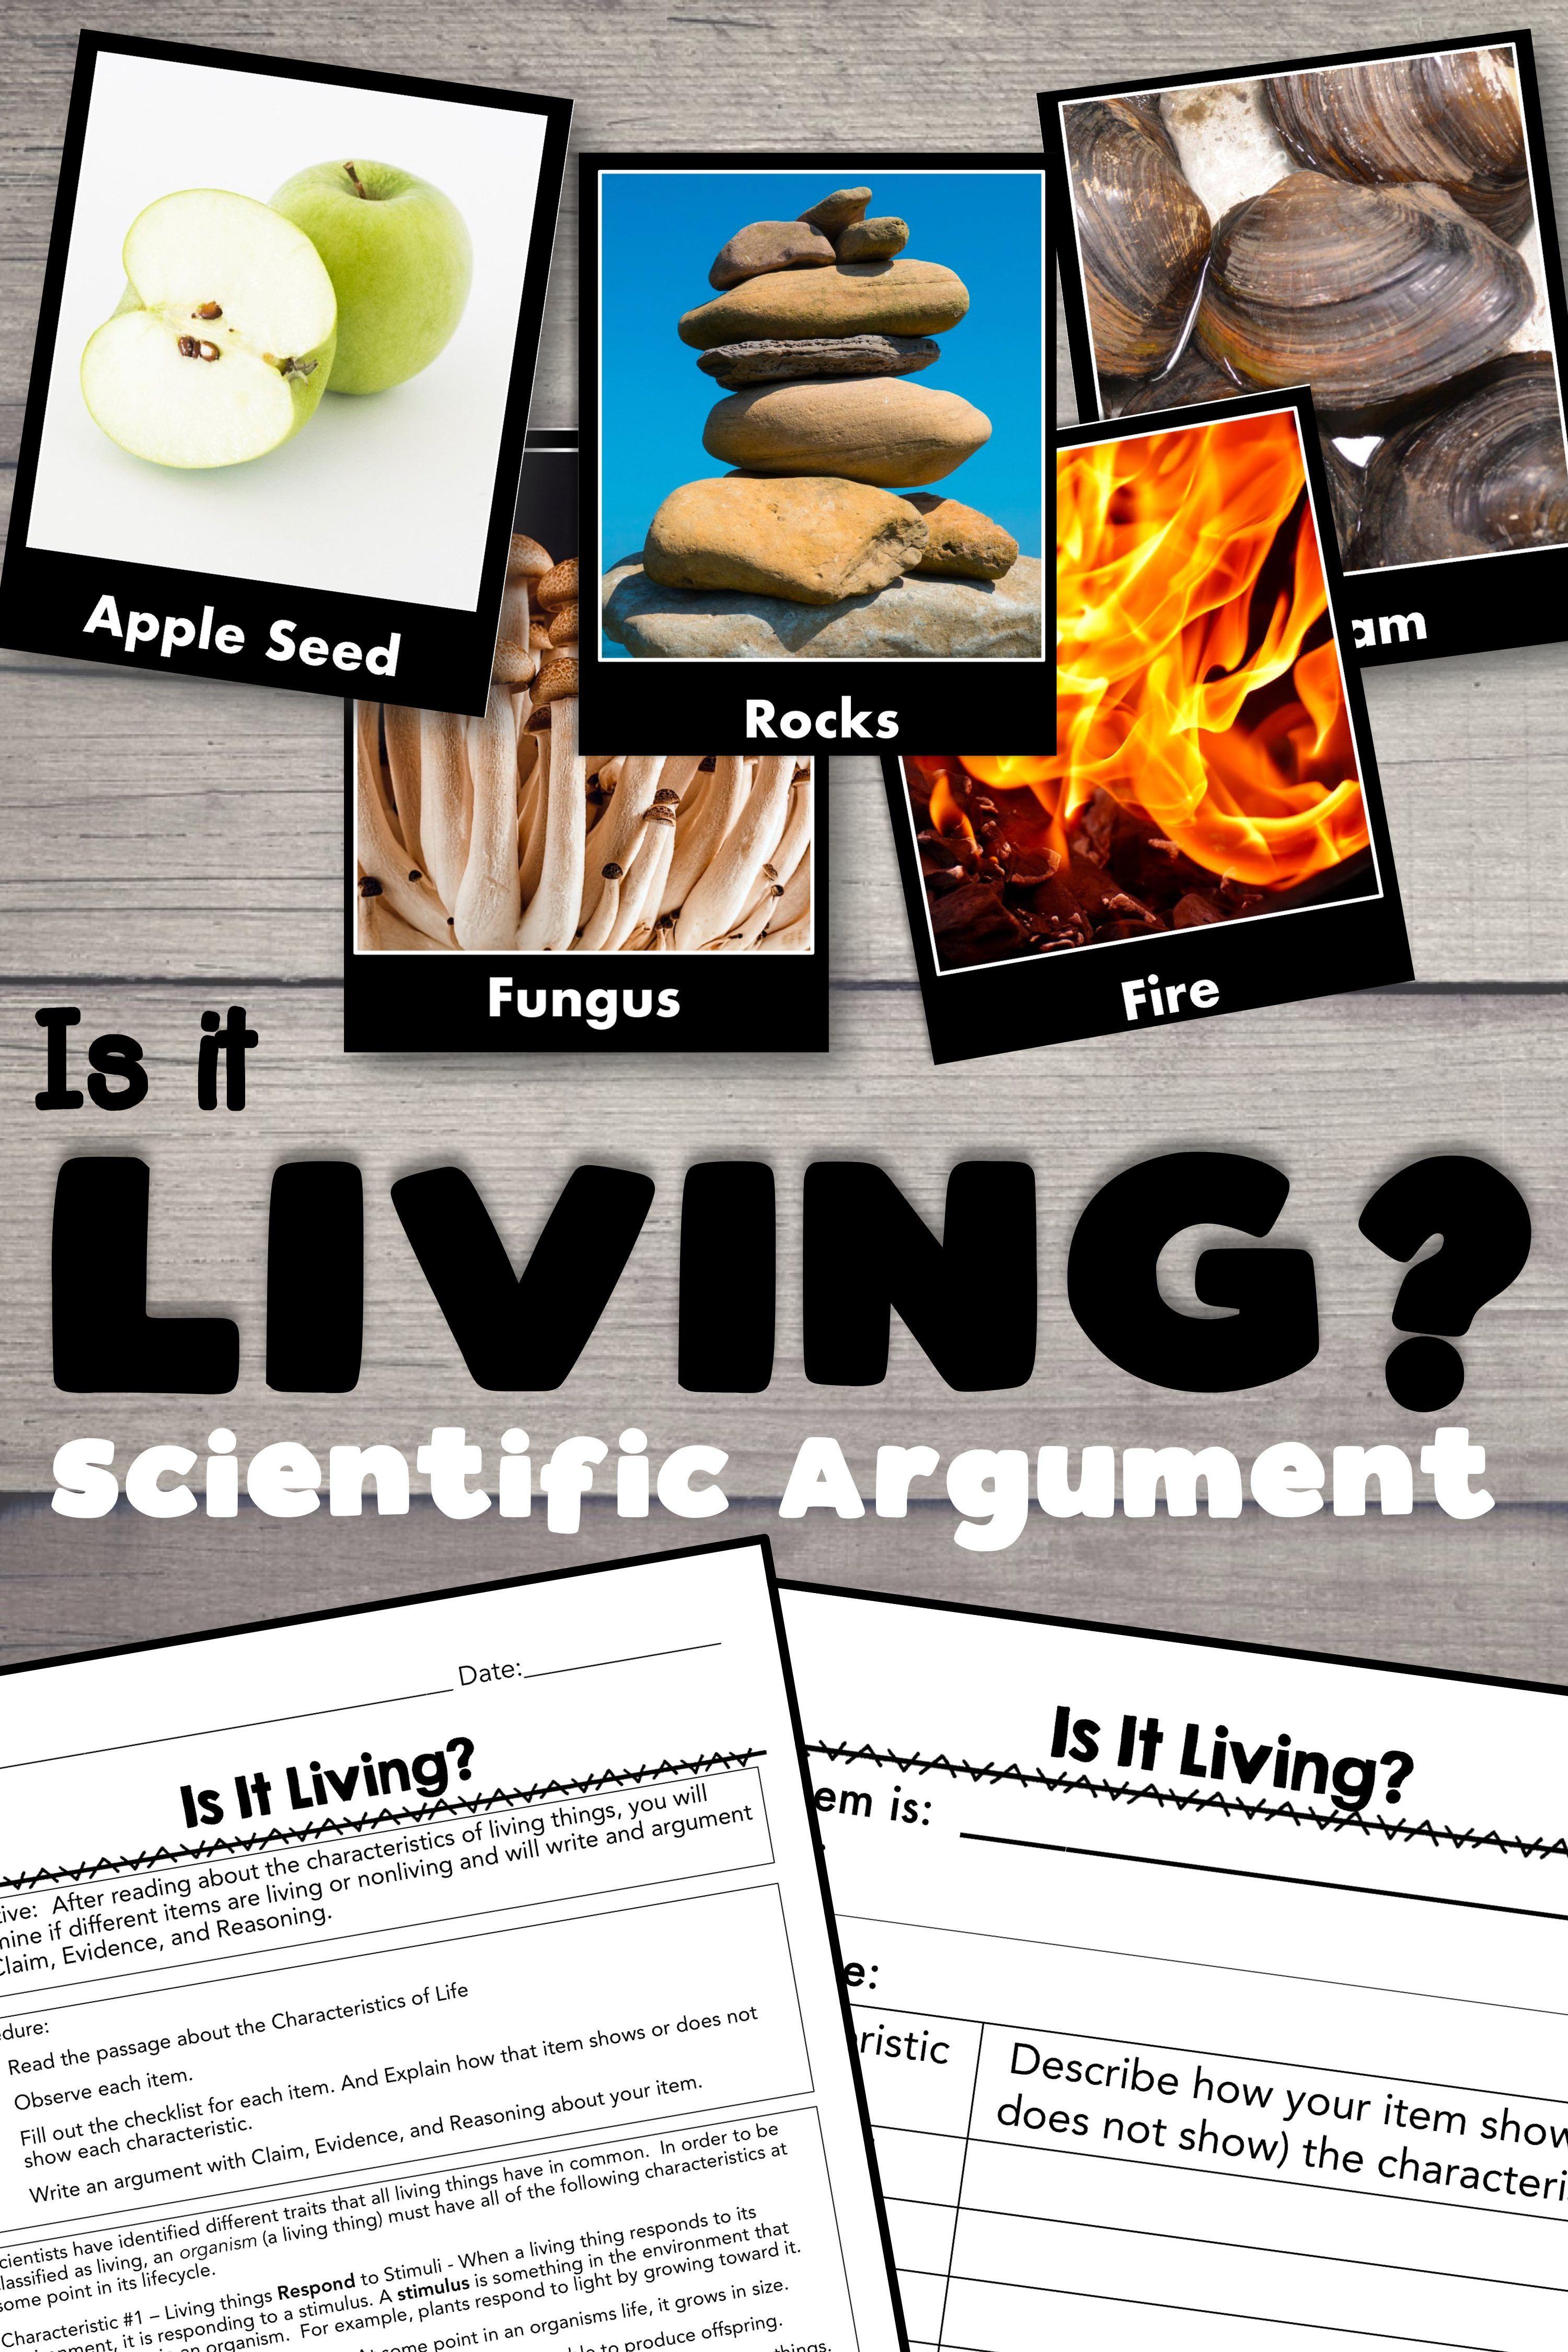 Characteristics Of Life Scientific Argument With Claim